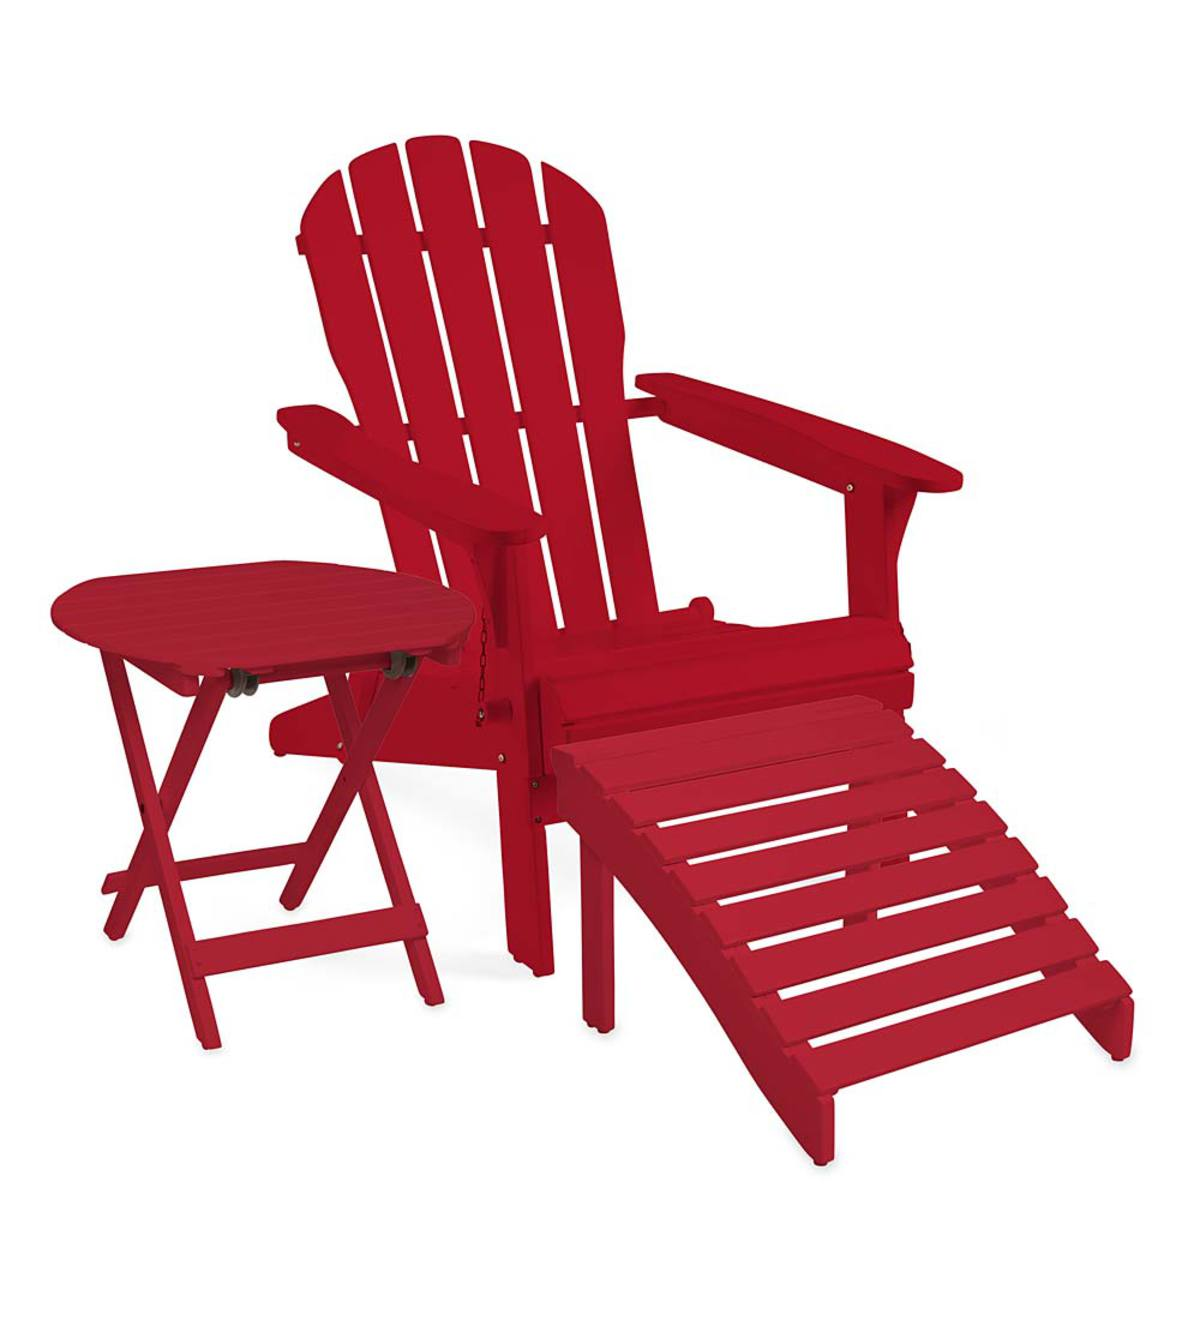 Sale! Wooden Adirondack Outdoor Furniture   Outdoor Living ... on Outdoor Living Sale id=17875